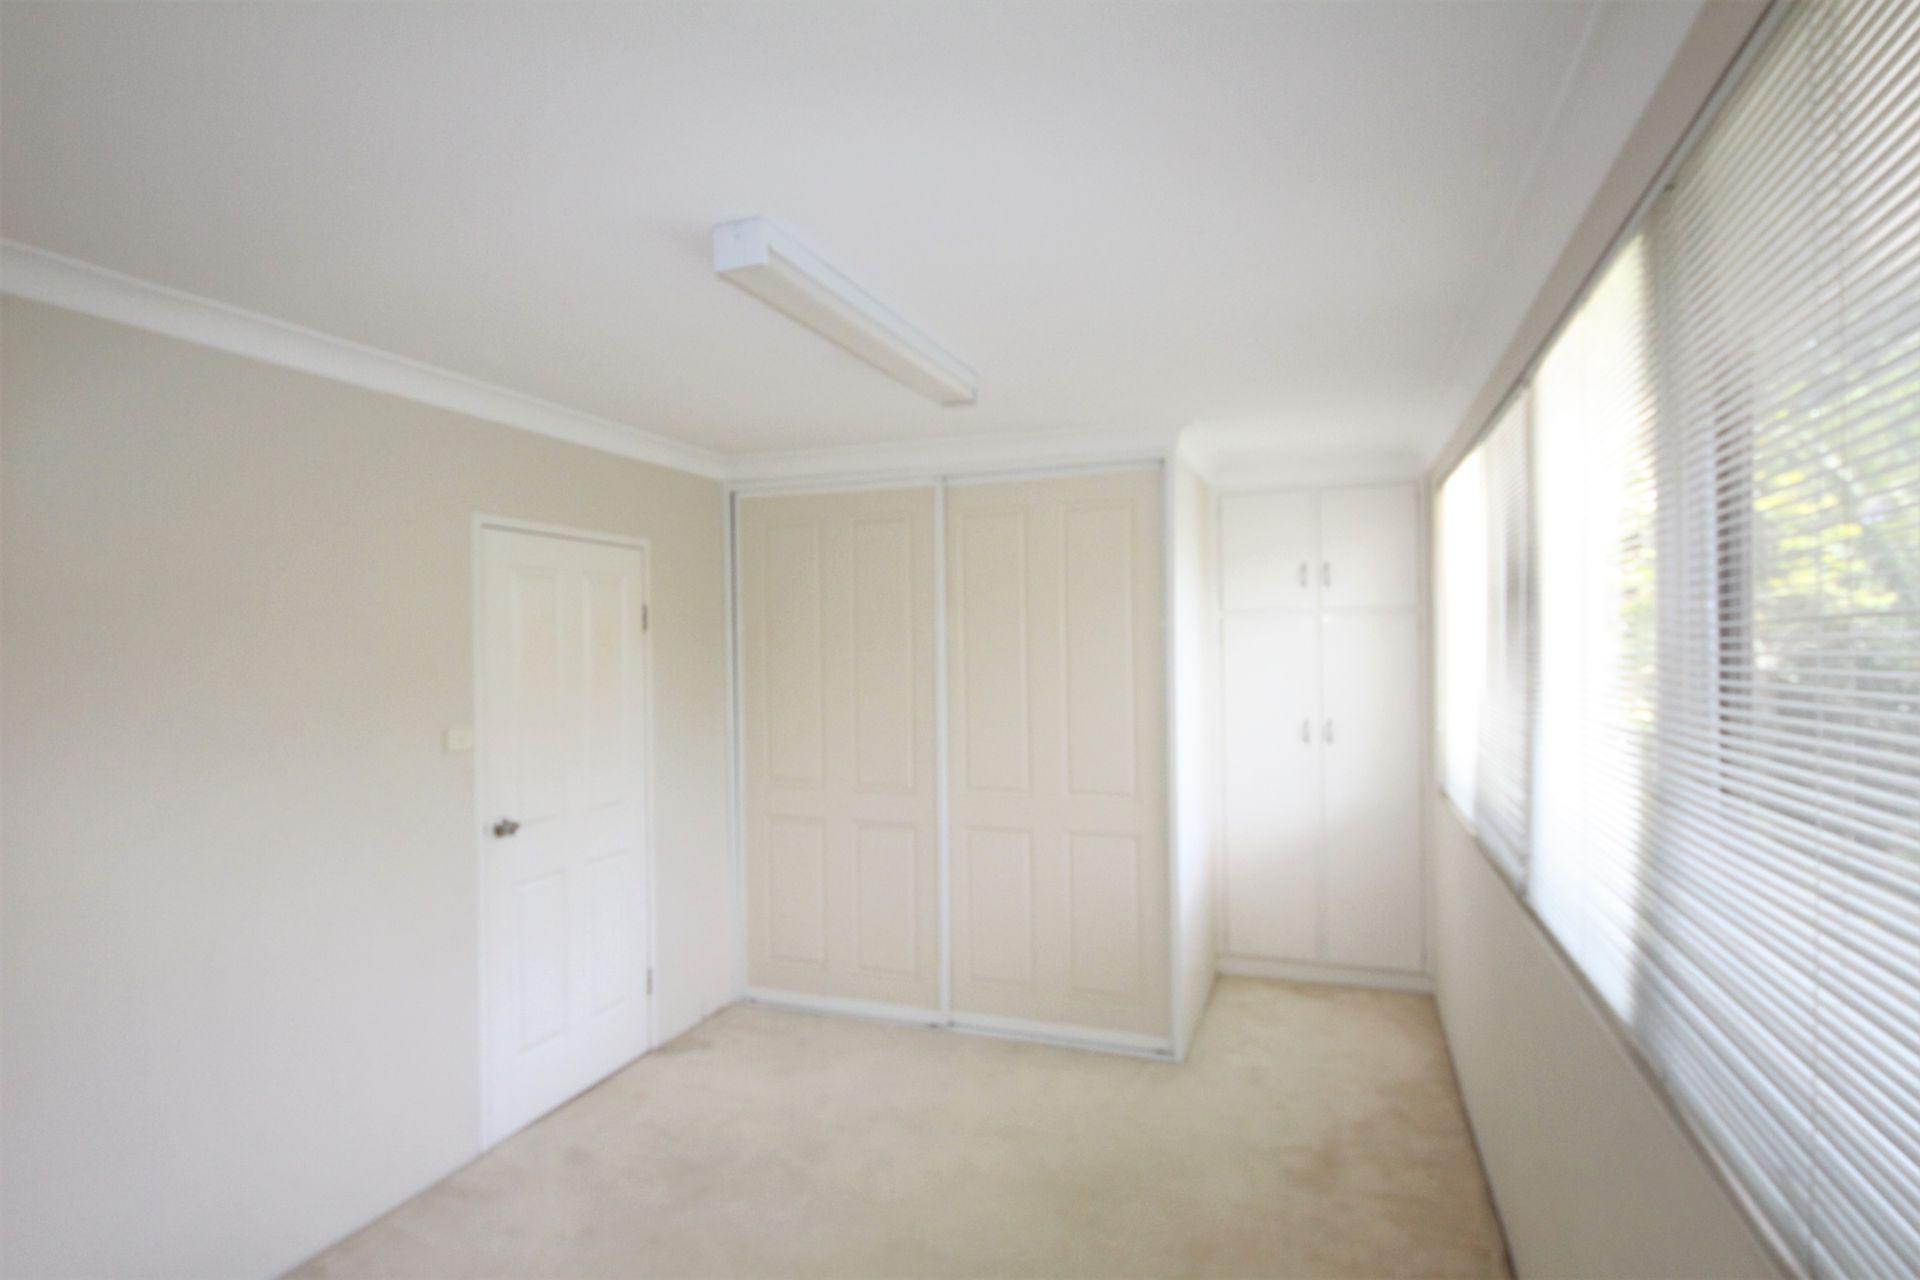 14/46 St Albans Street, Abbotsford NSW